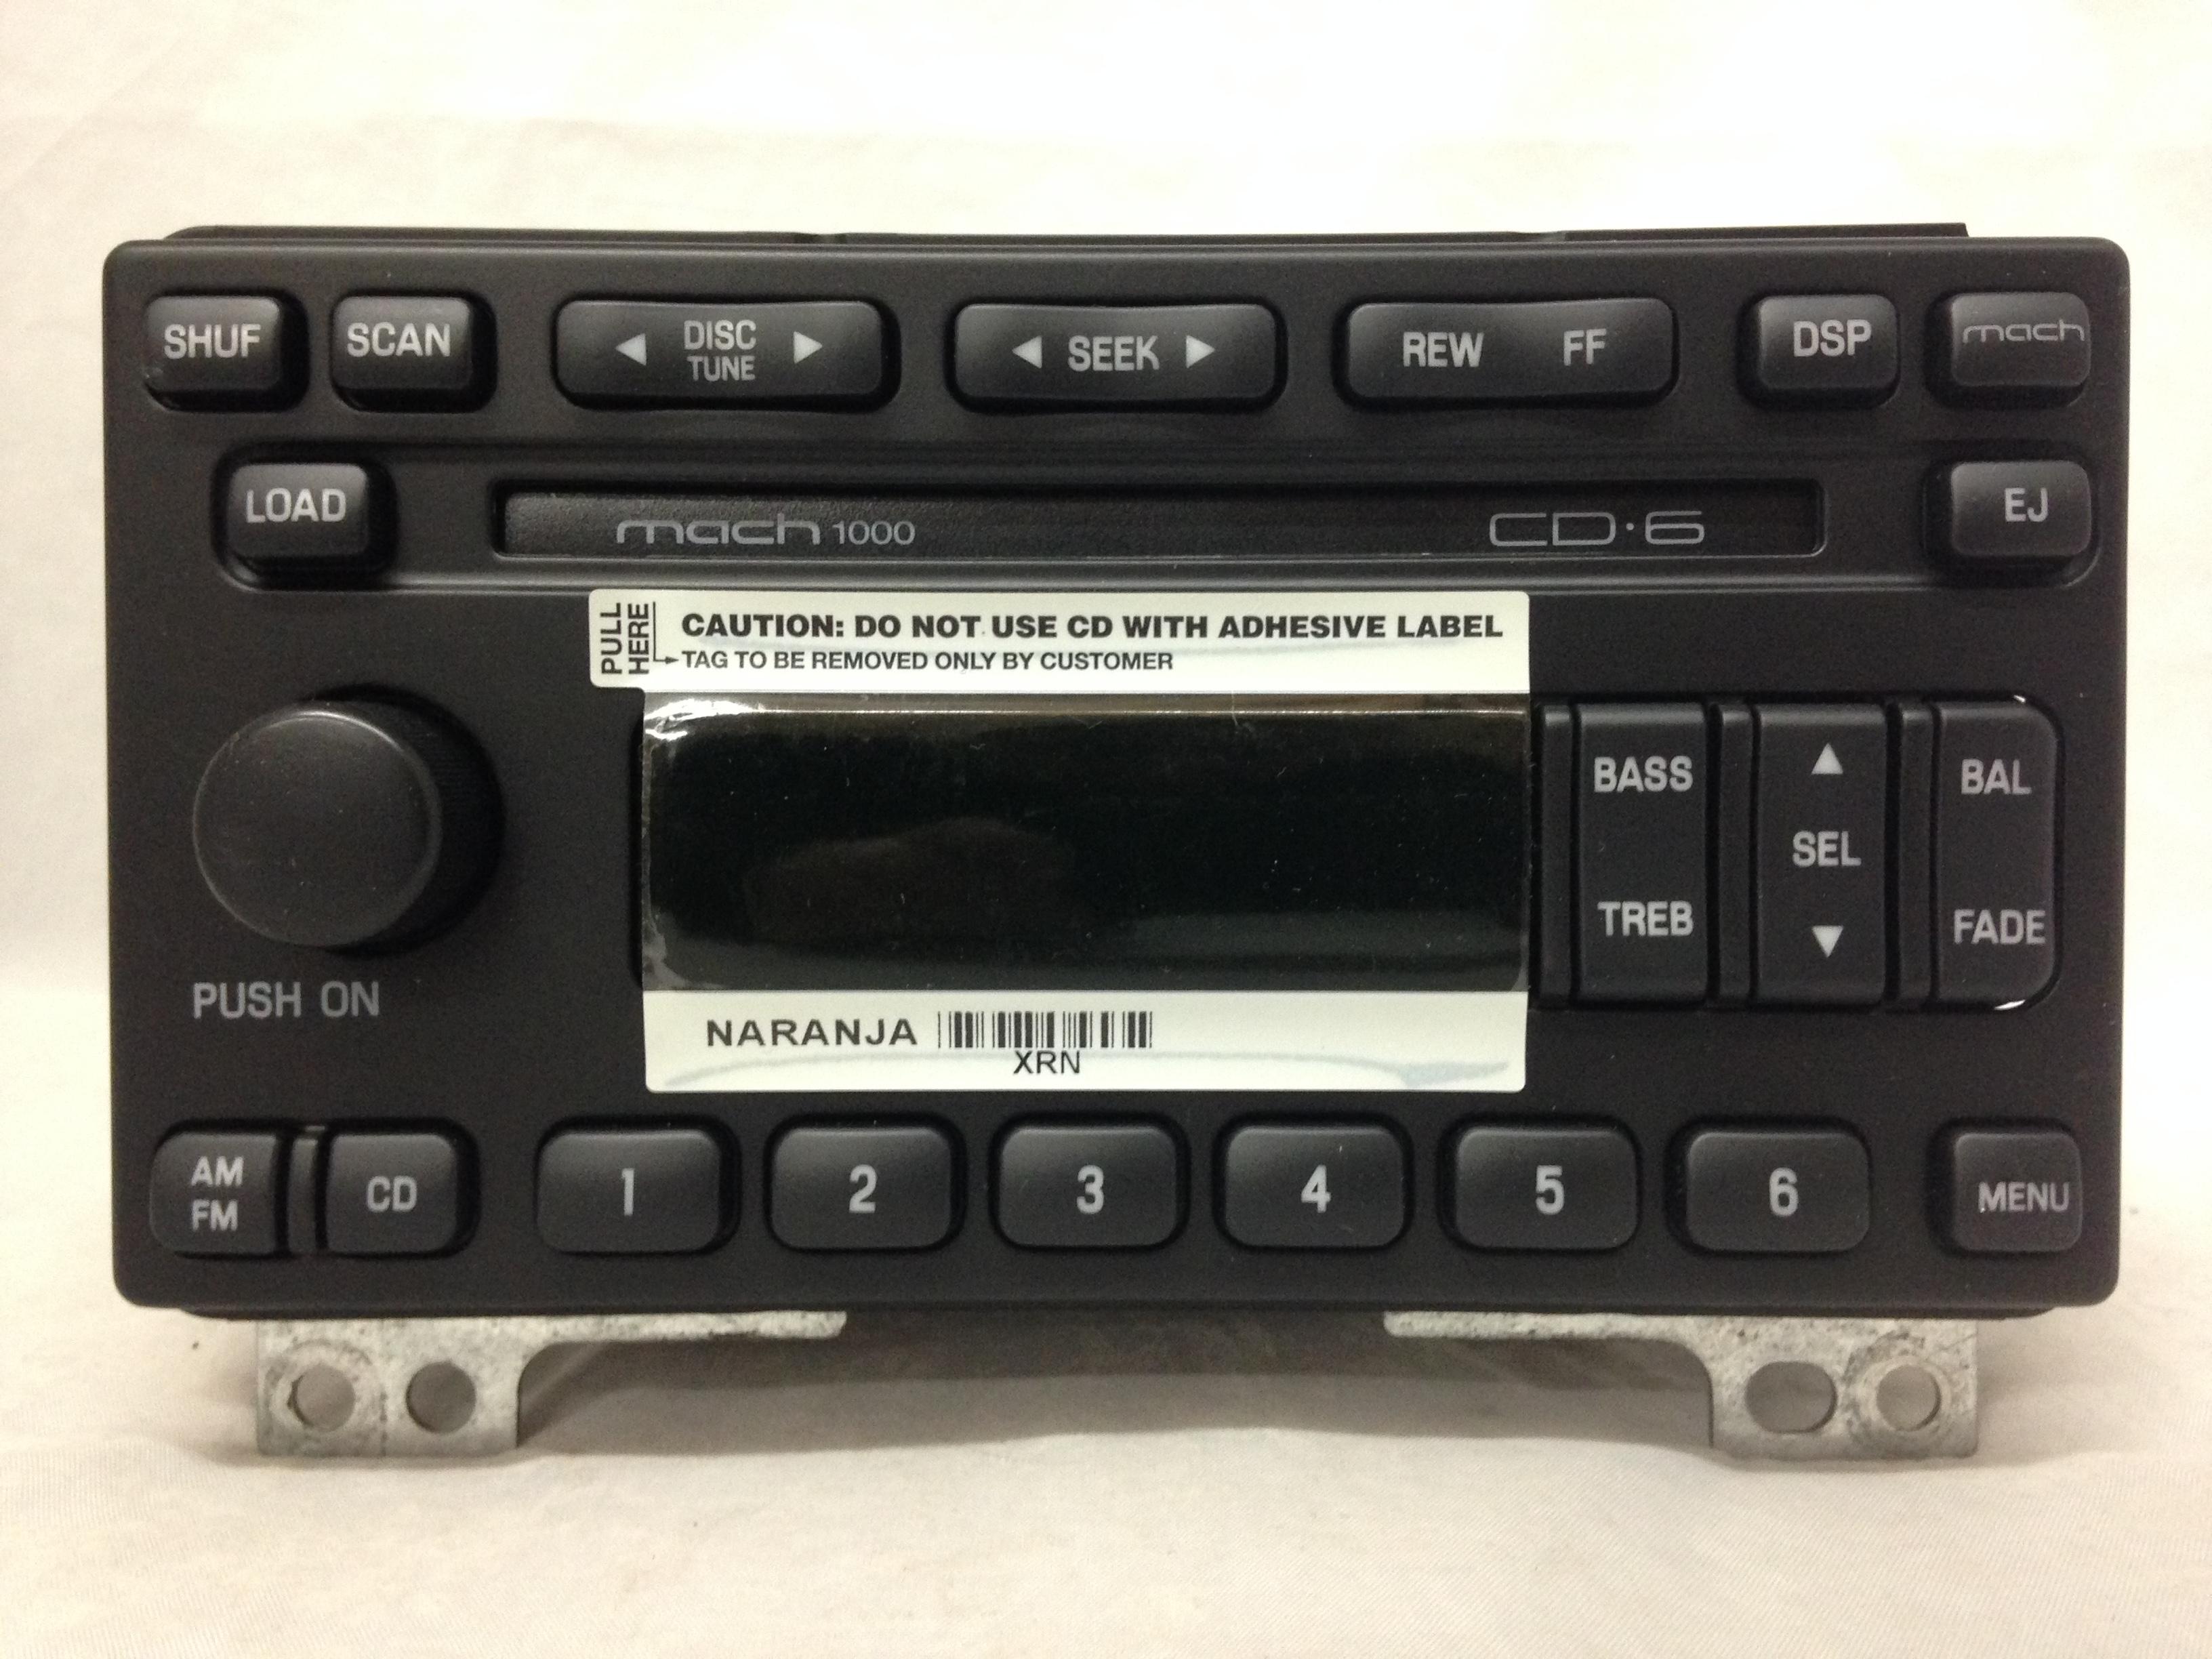 Ford Mustang R T C Gb Radio on Chevy Uplander Van